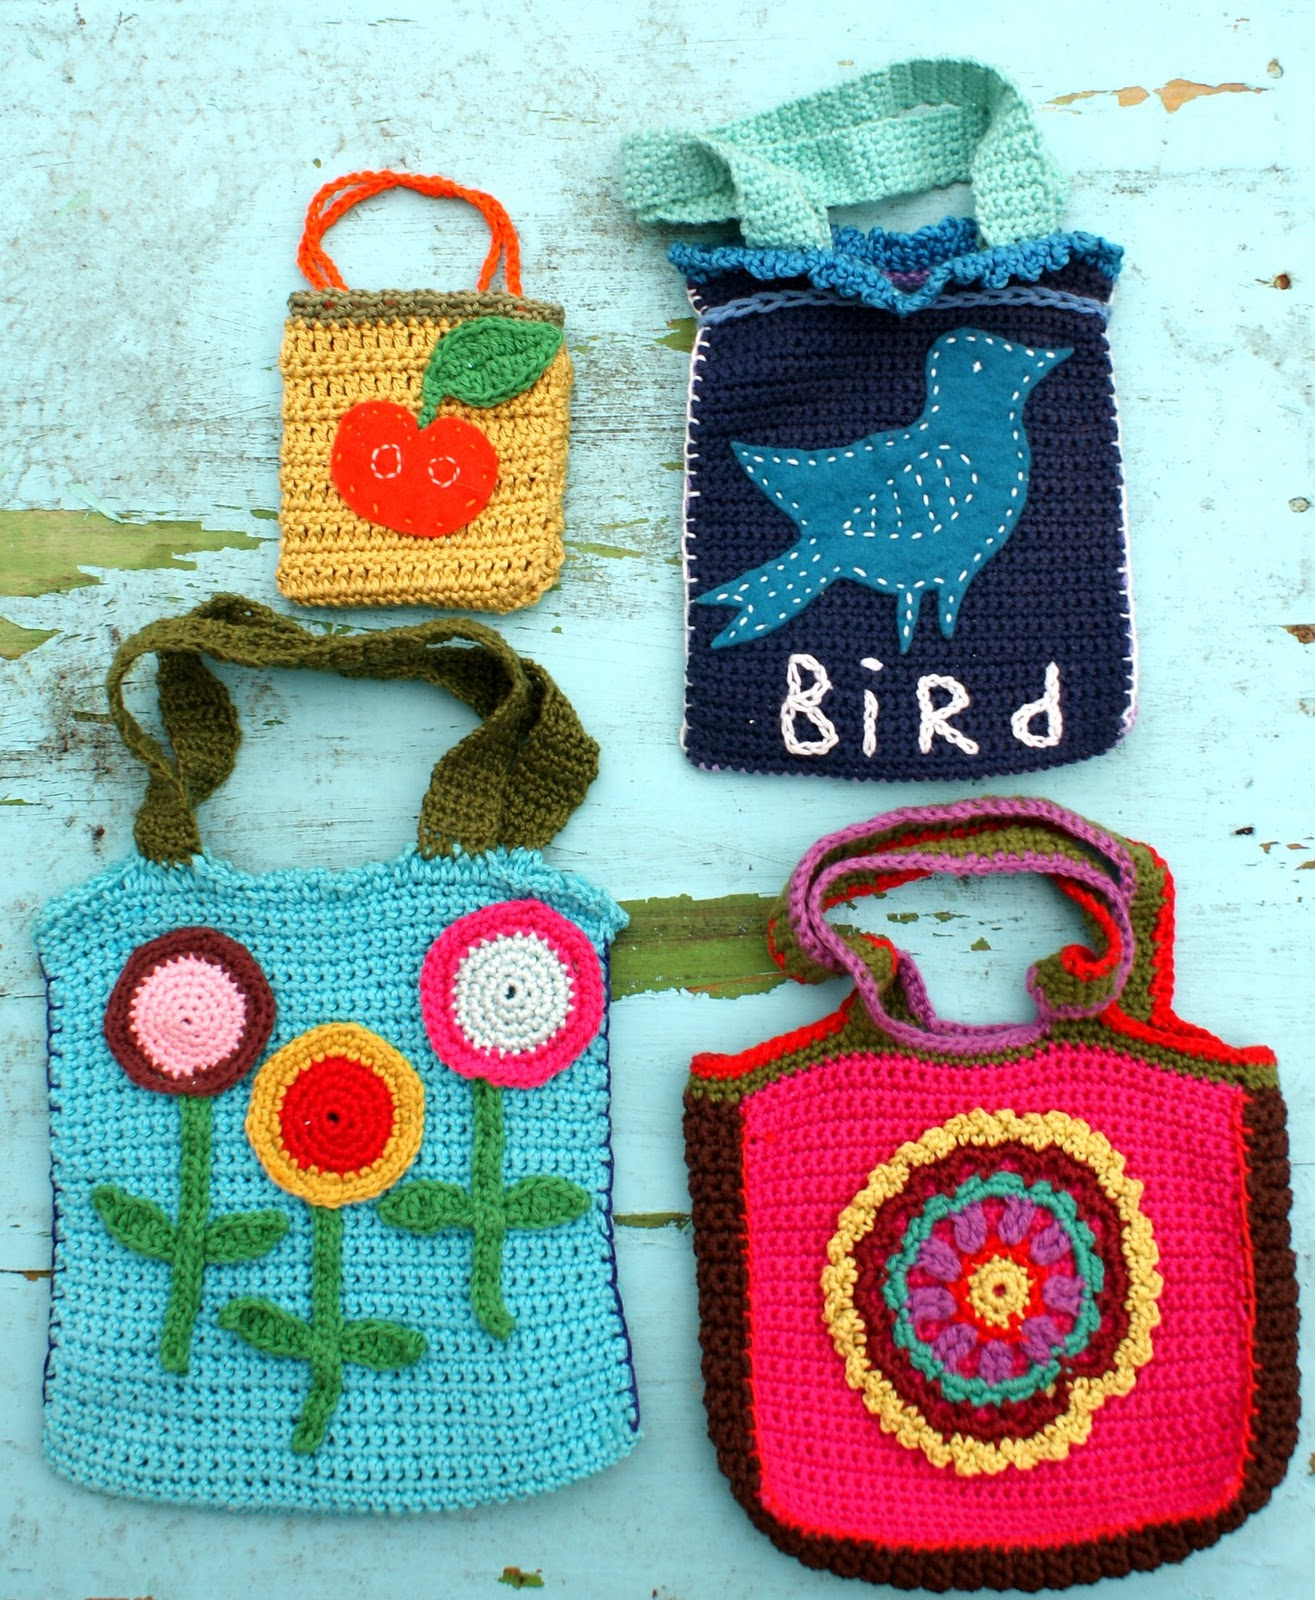 Simple Crochet Purse : ingthings: Simple crochet bag